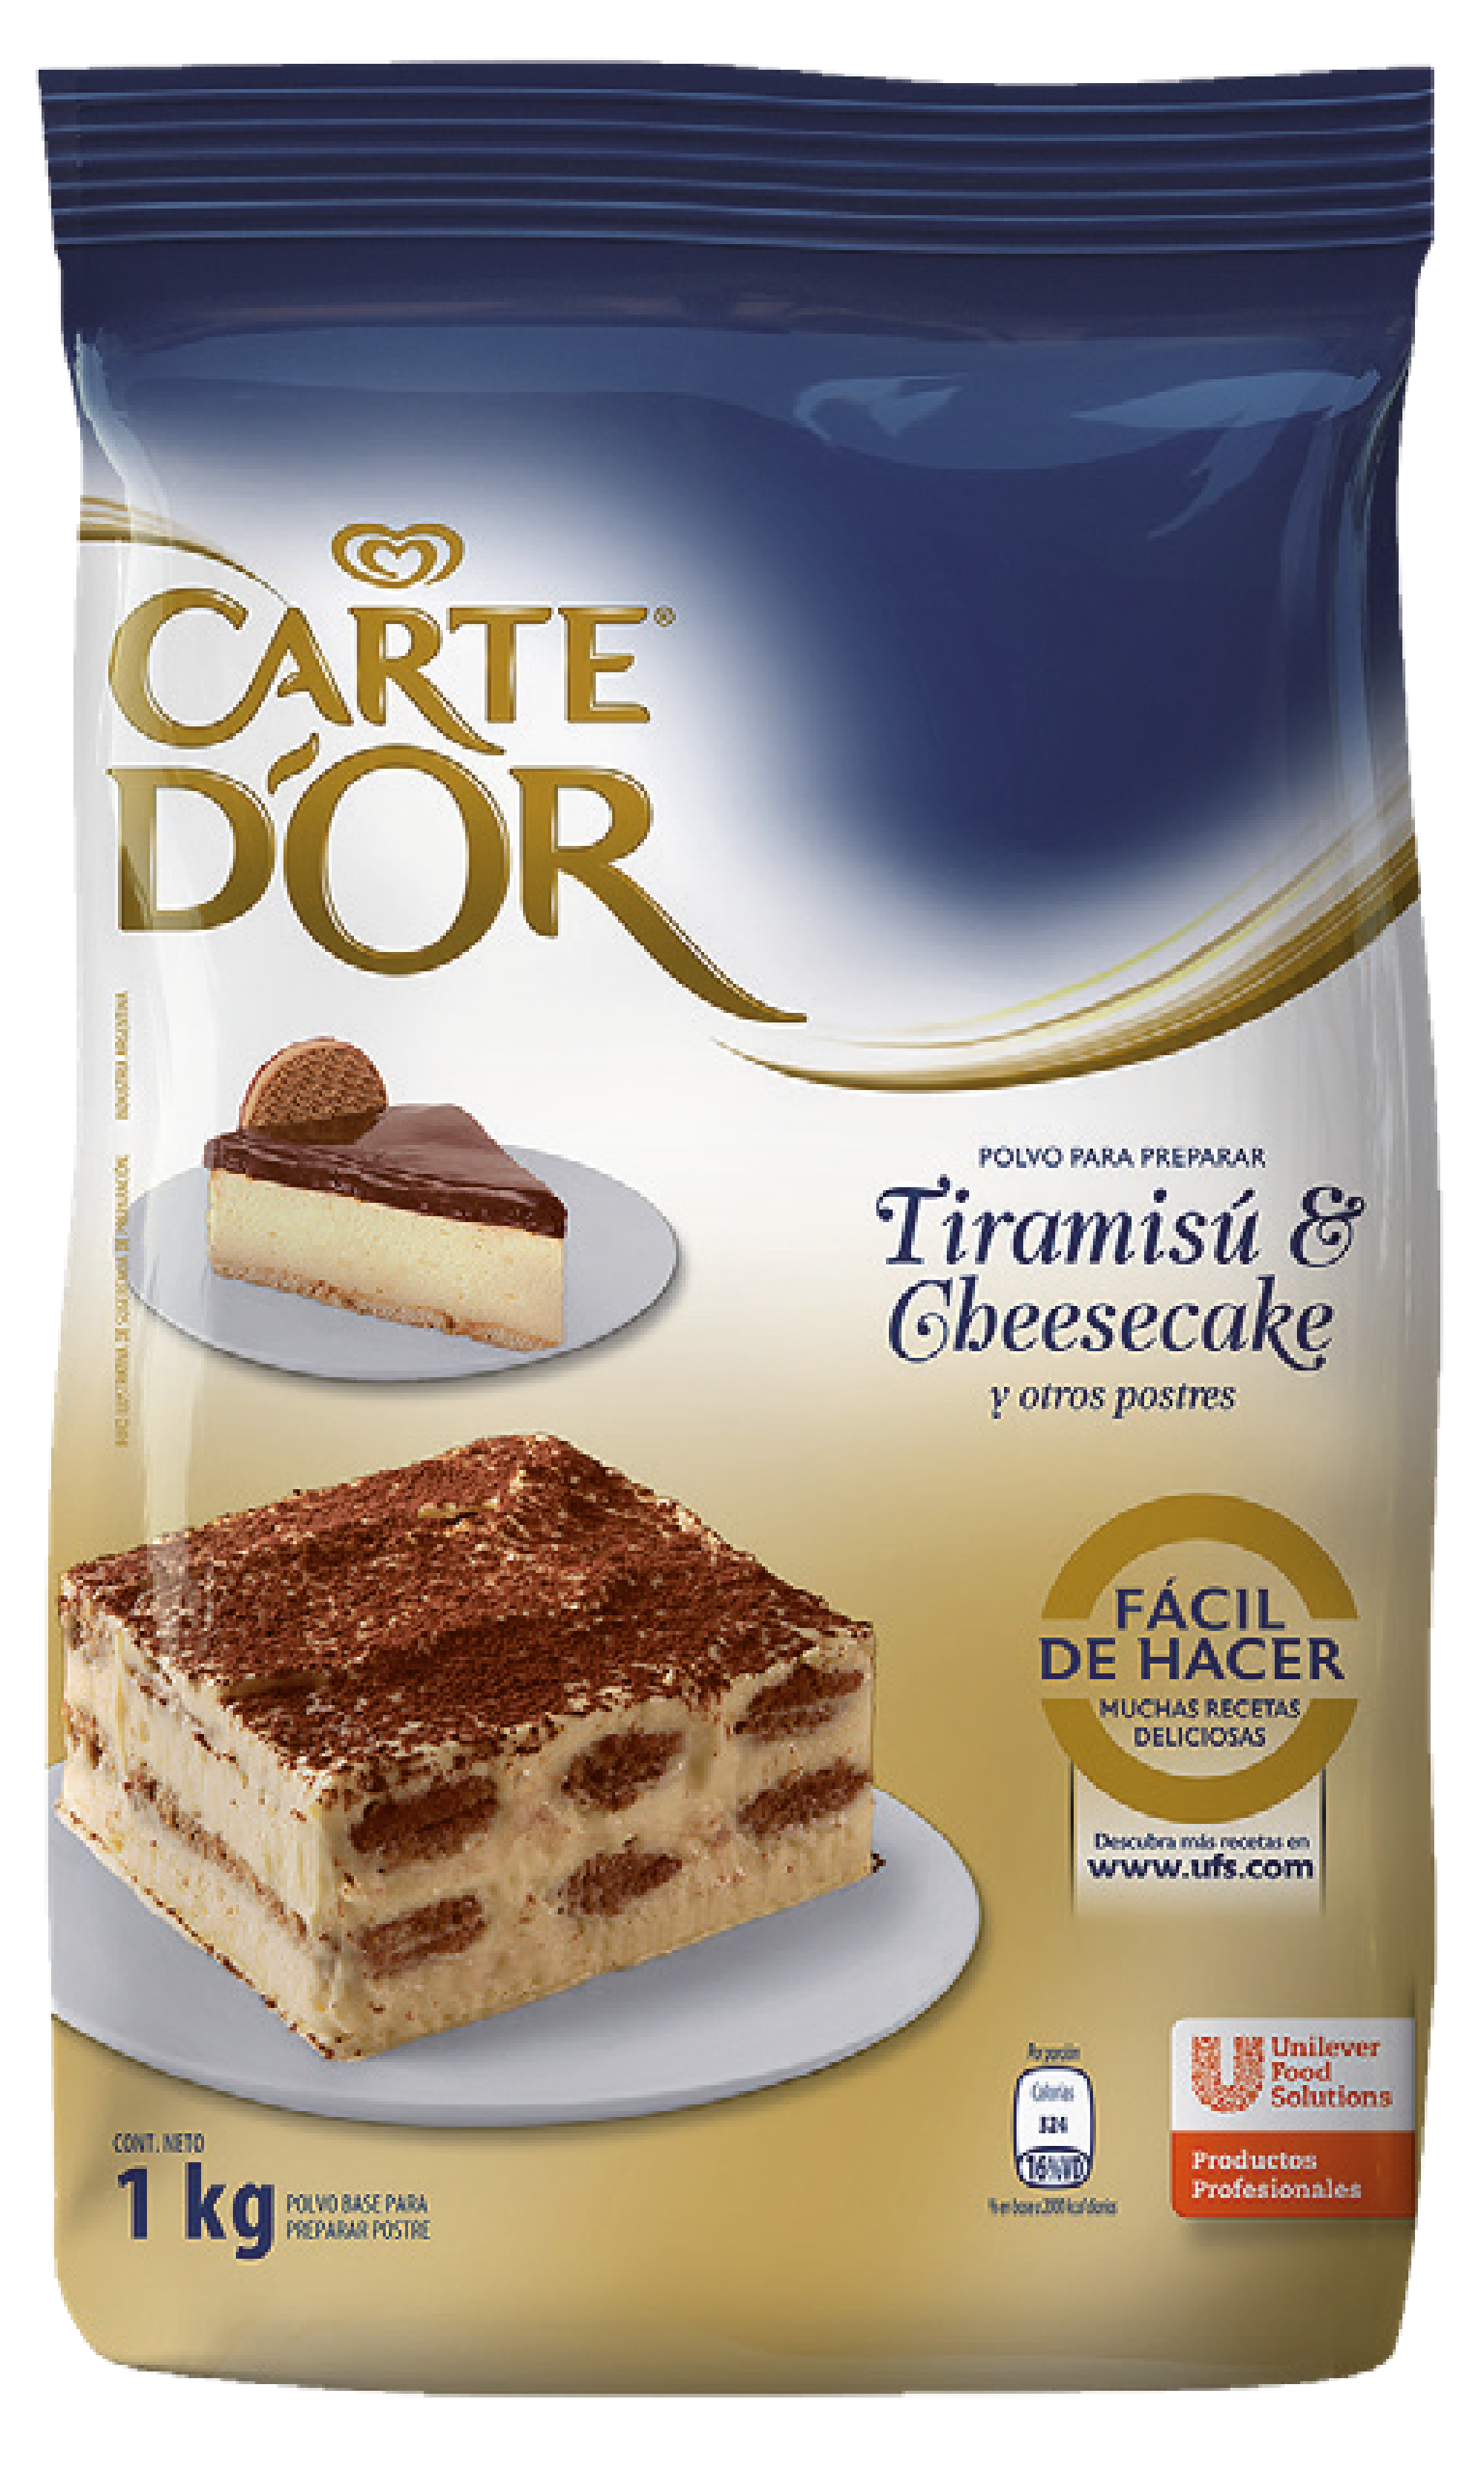 Tiramisú y Cheesecake Carte D'or 1KG